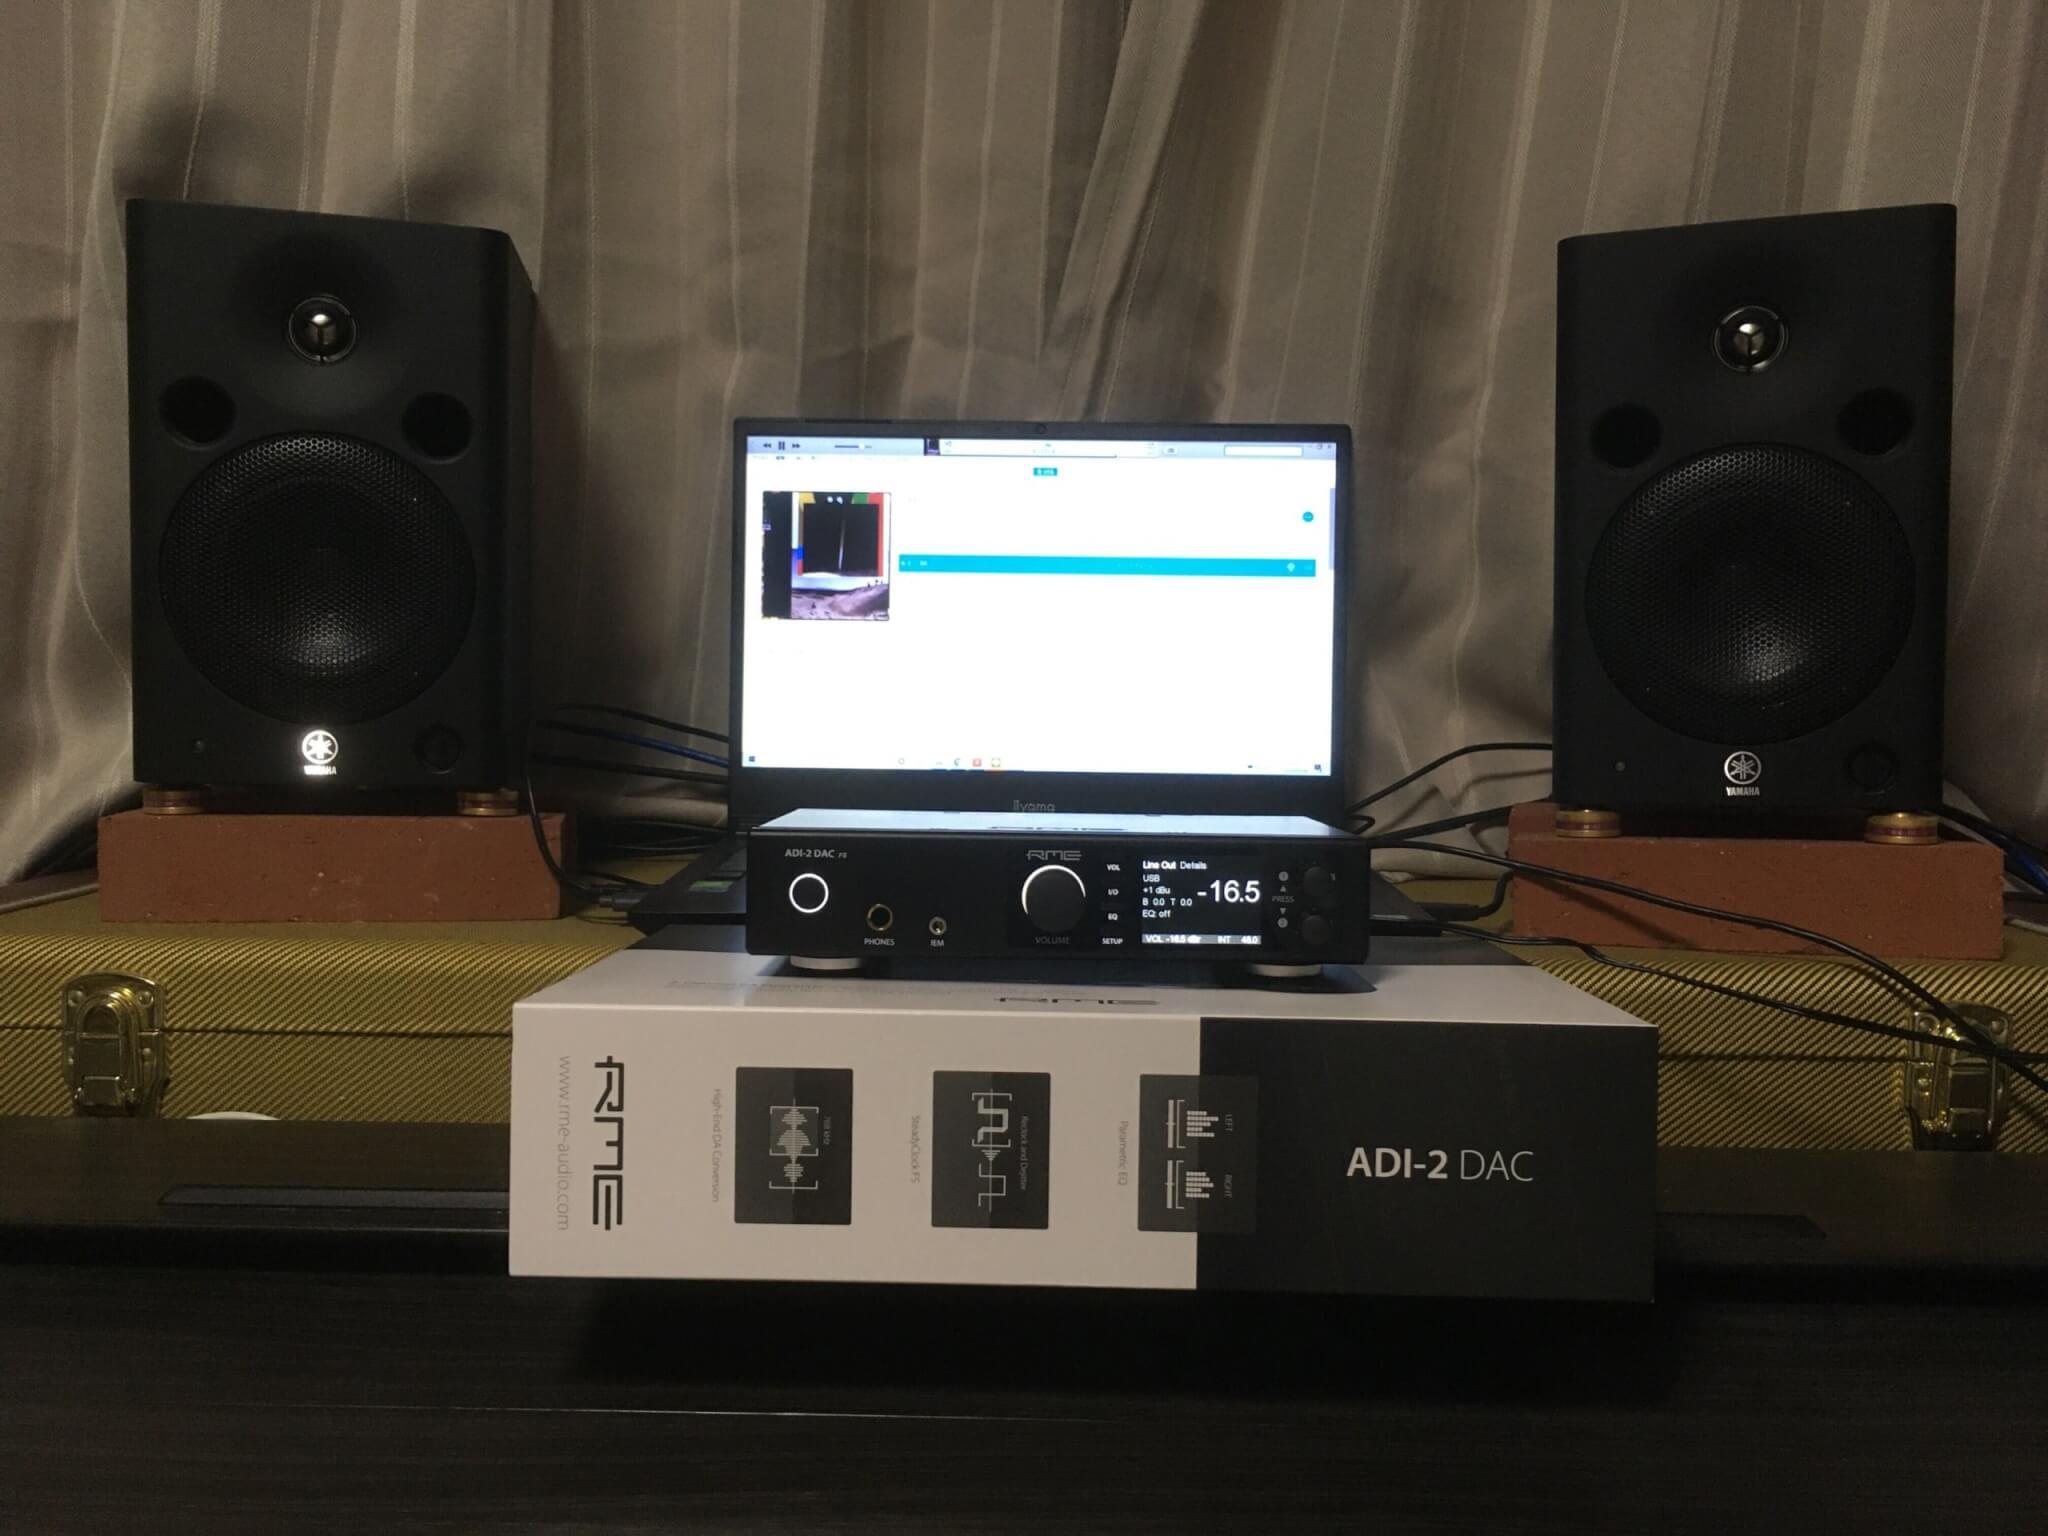 ADI-2 DAC FS 試聴